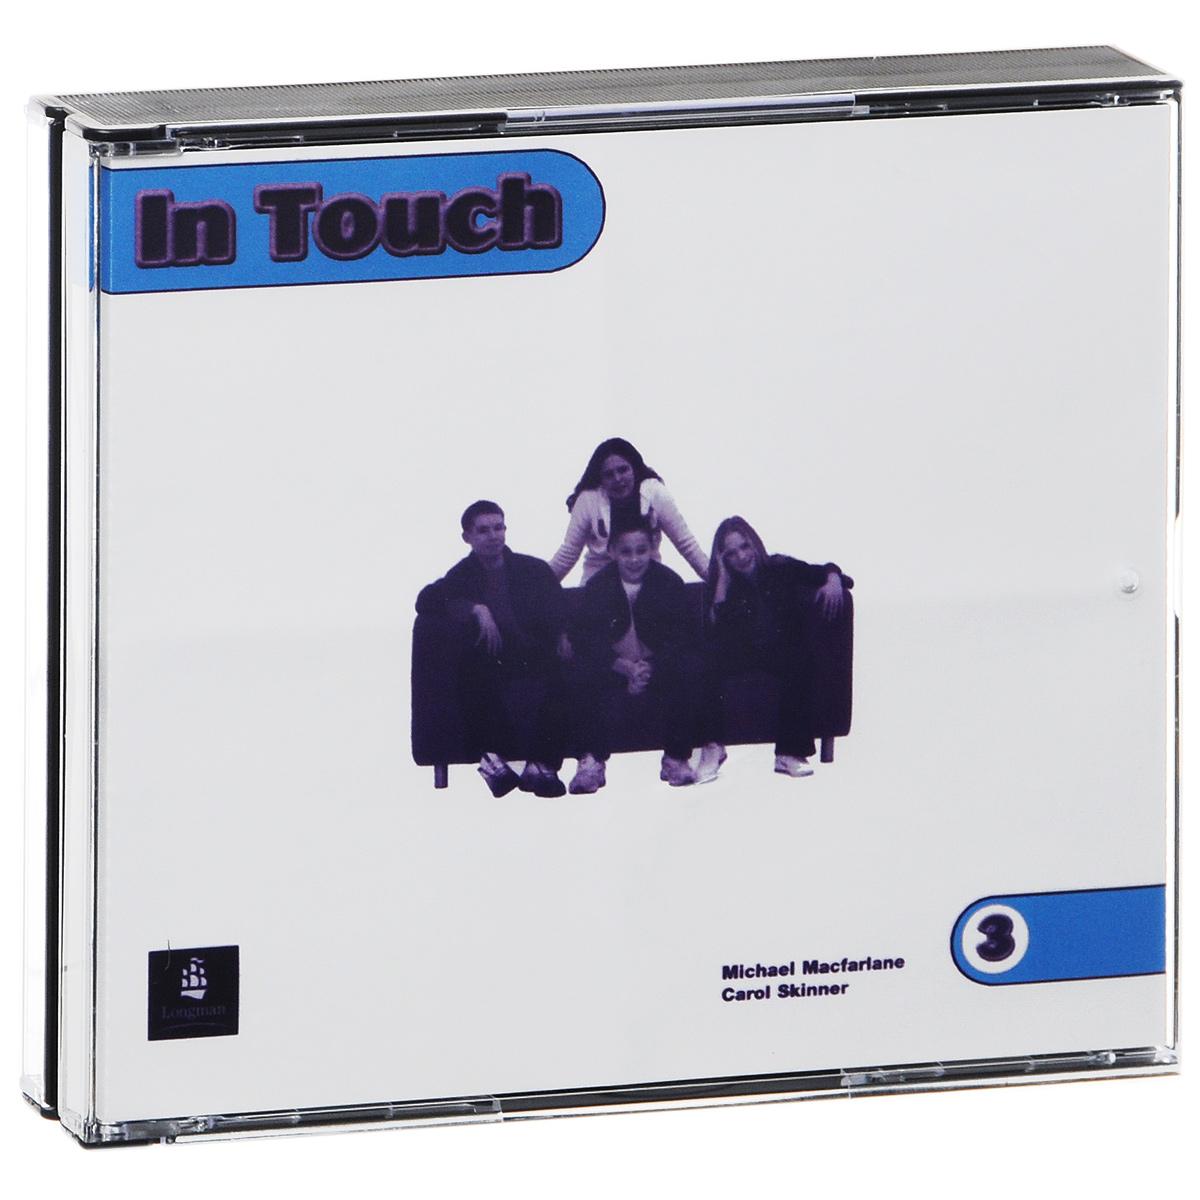 цены на In Touch 3 (аудиокурс на 3 CD)  в интернет-магазинах